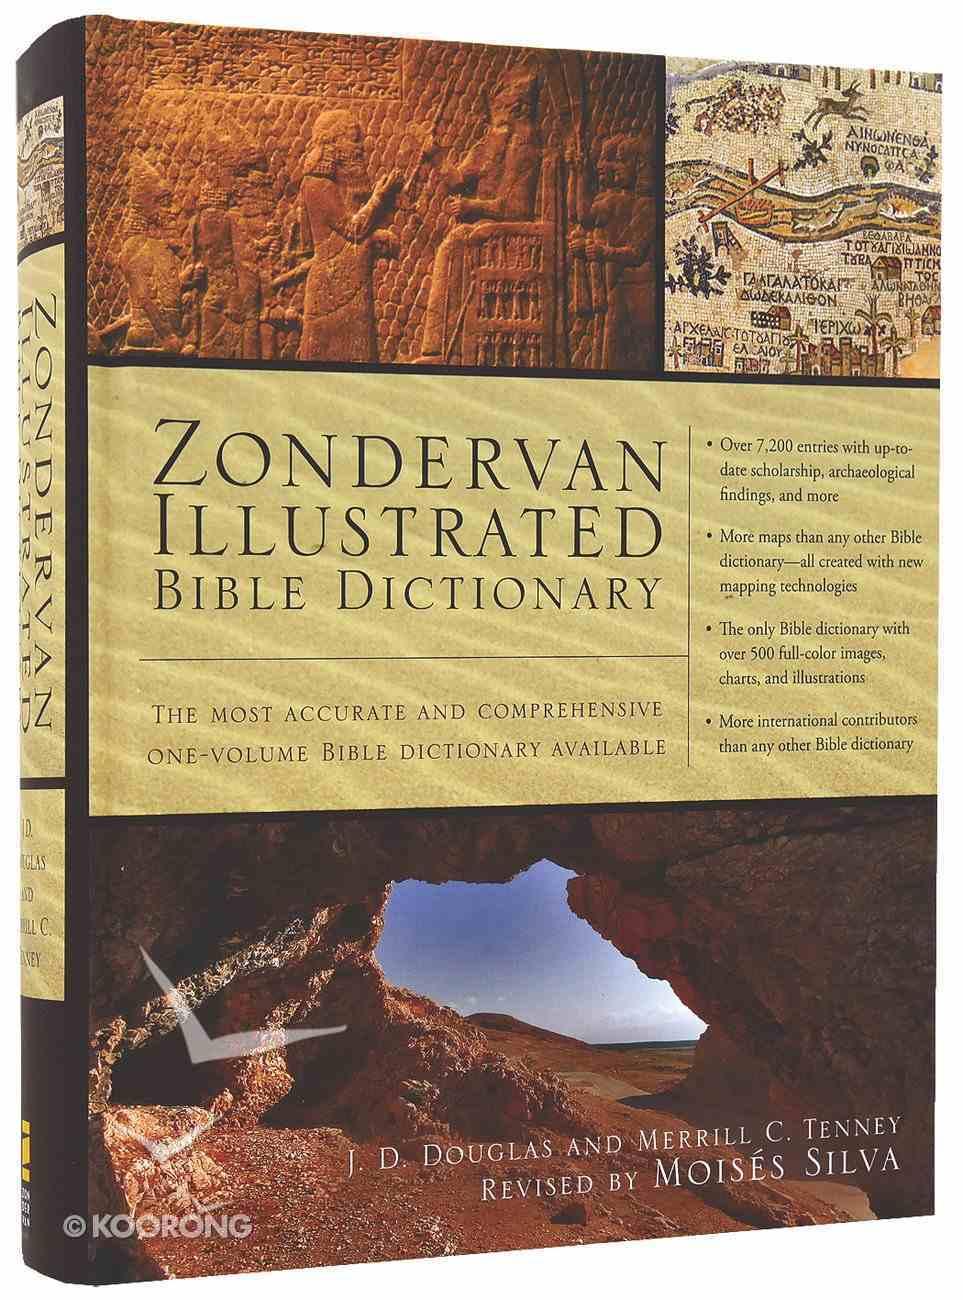 Zibd: Zondervan Illustrated Bible Dictionary (2010 Moises Silva) Hardback